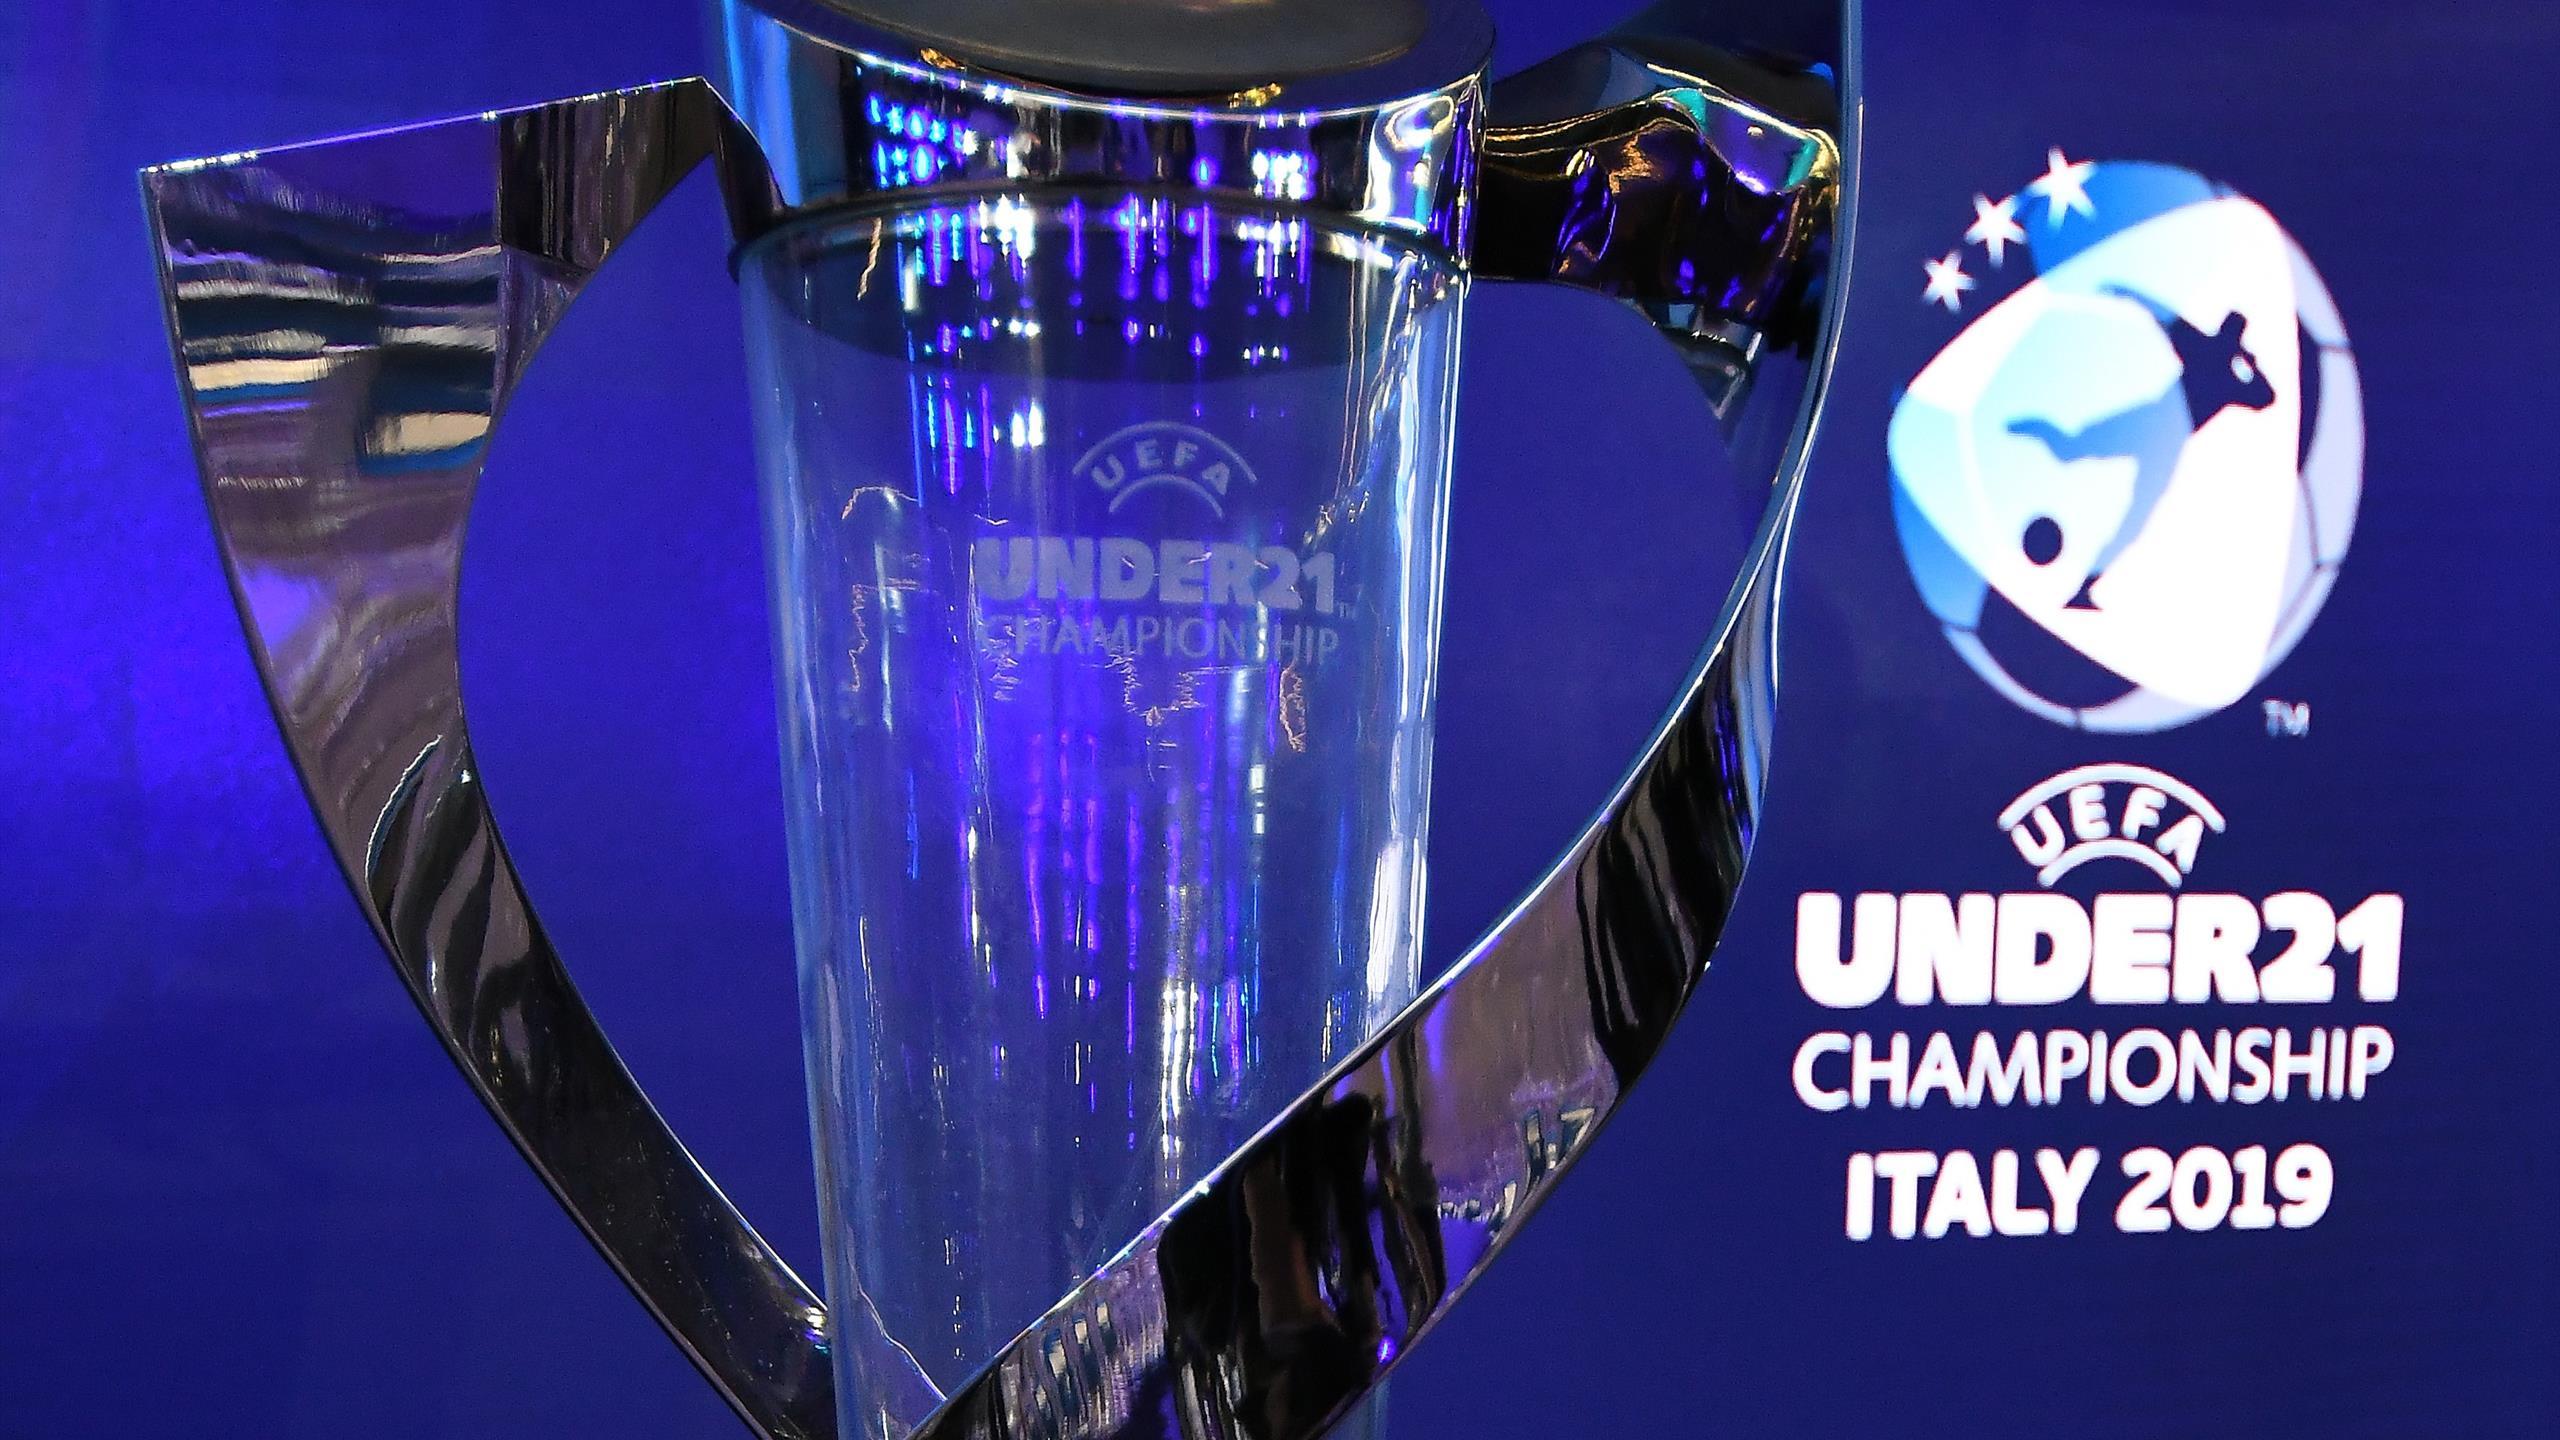 European Under-21 Championship 2019: Fixtures, Golden Boot, schedule, how to watch, odds, squads